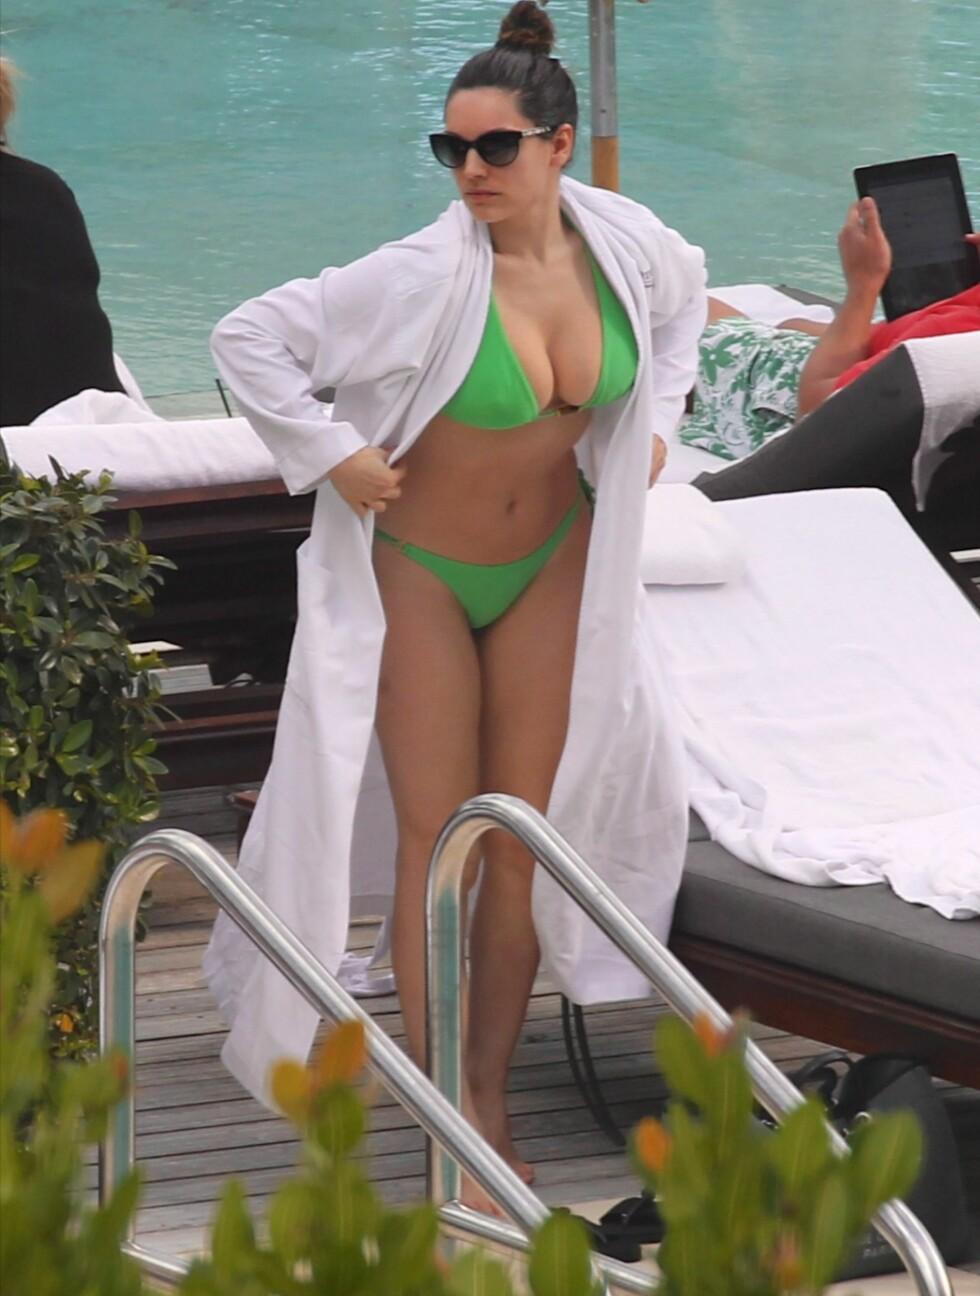 SEXY: Kelly Brook viste frem en flott kropp - men et mutt fjes - ved bassenget på Setai Hotel i Miami Beach fredag.  Foto: All Over Press